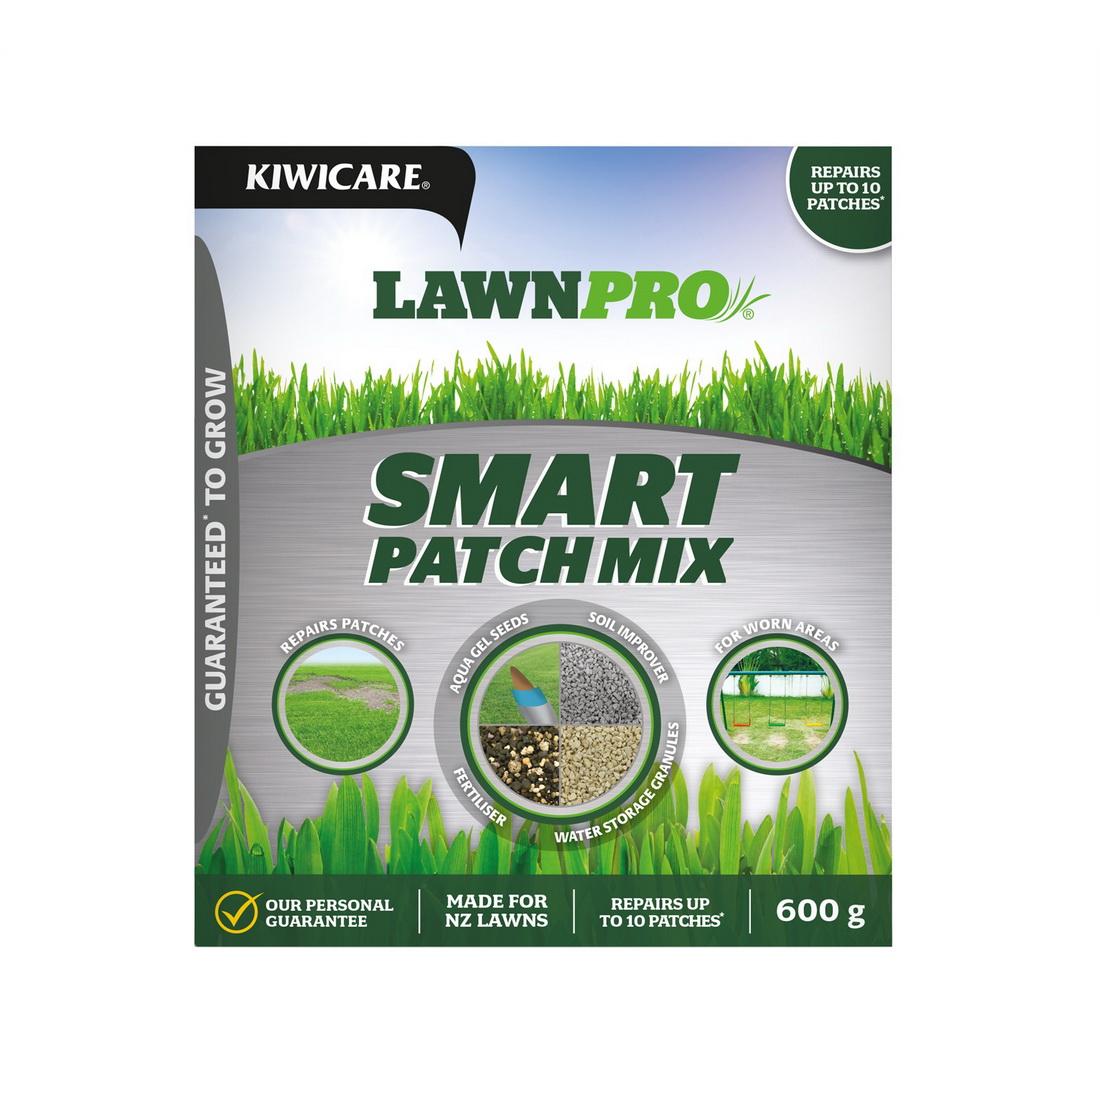 LawnPro Smart Patch Mix 600g G42115